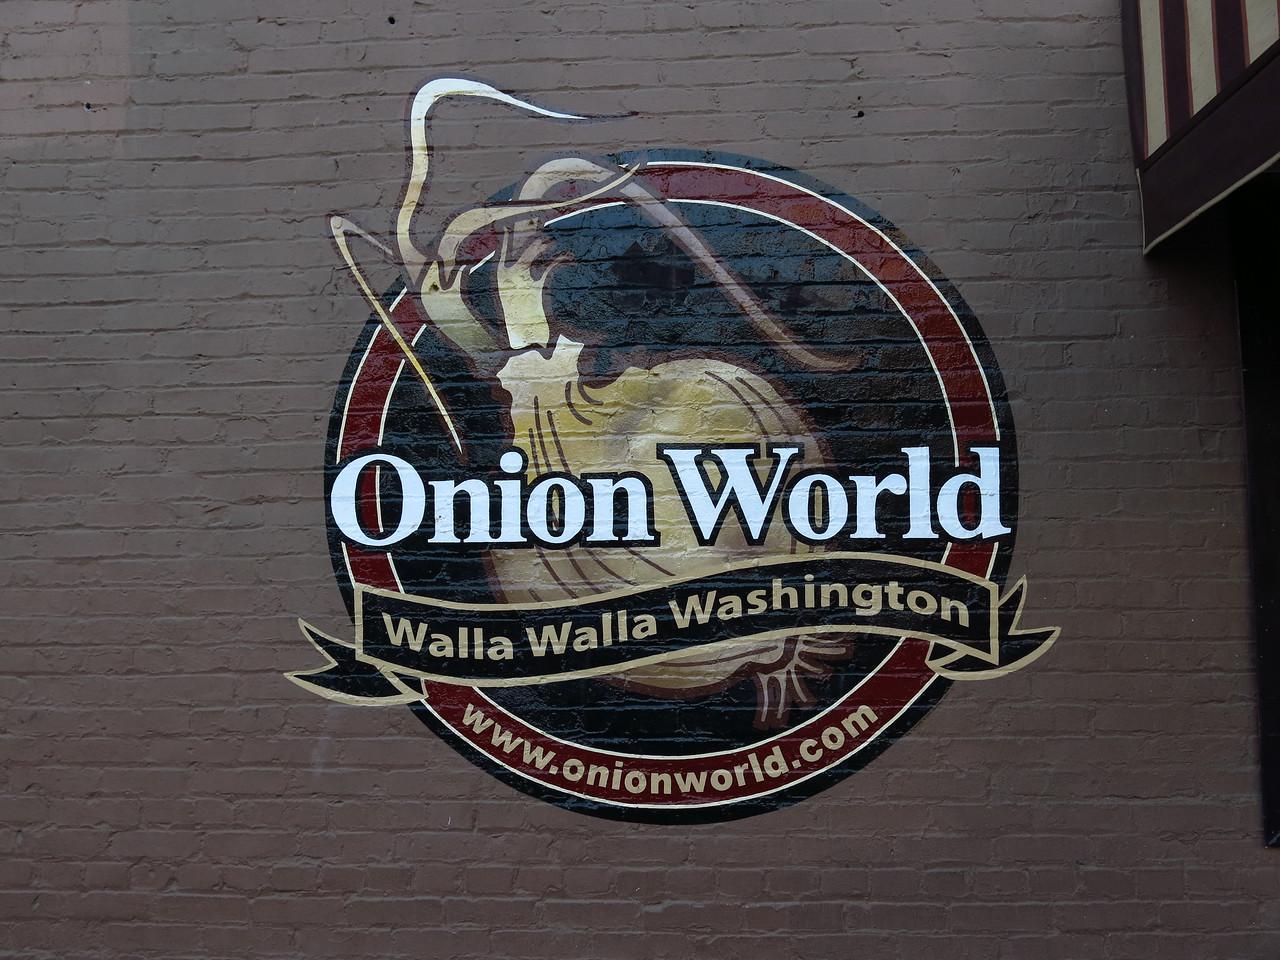 Walla Walla onions are very sweet.